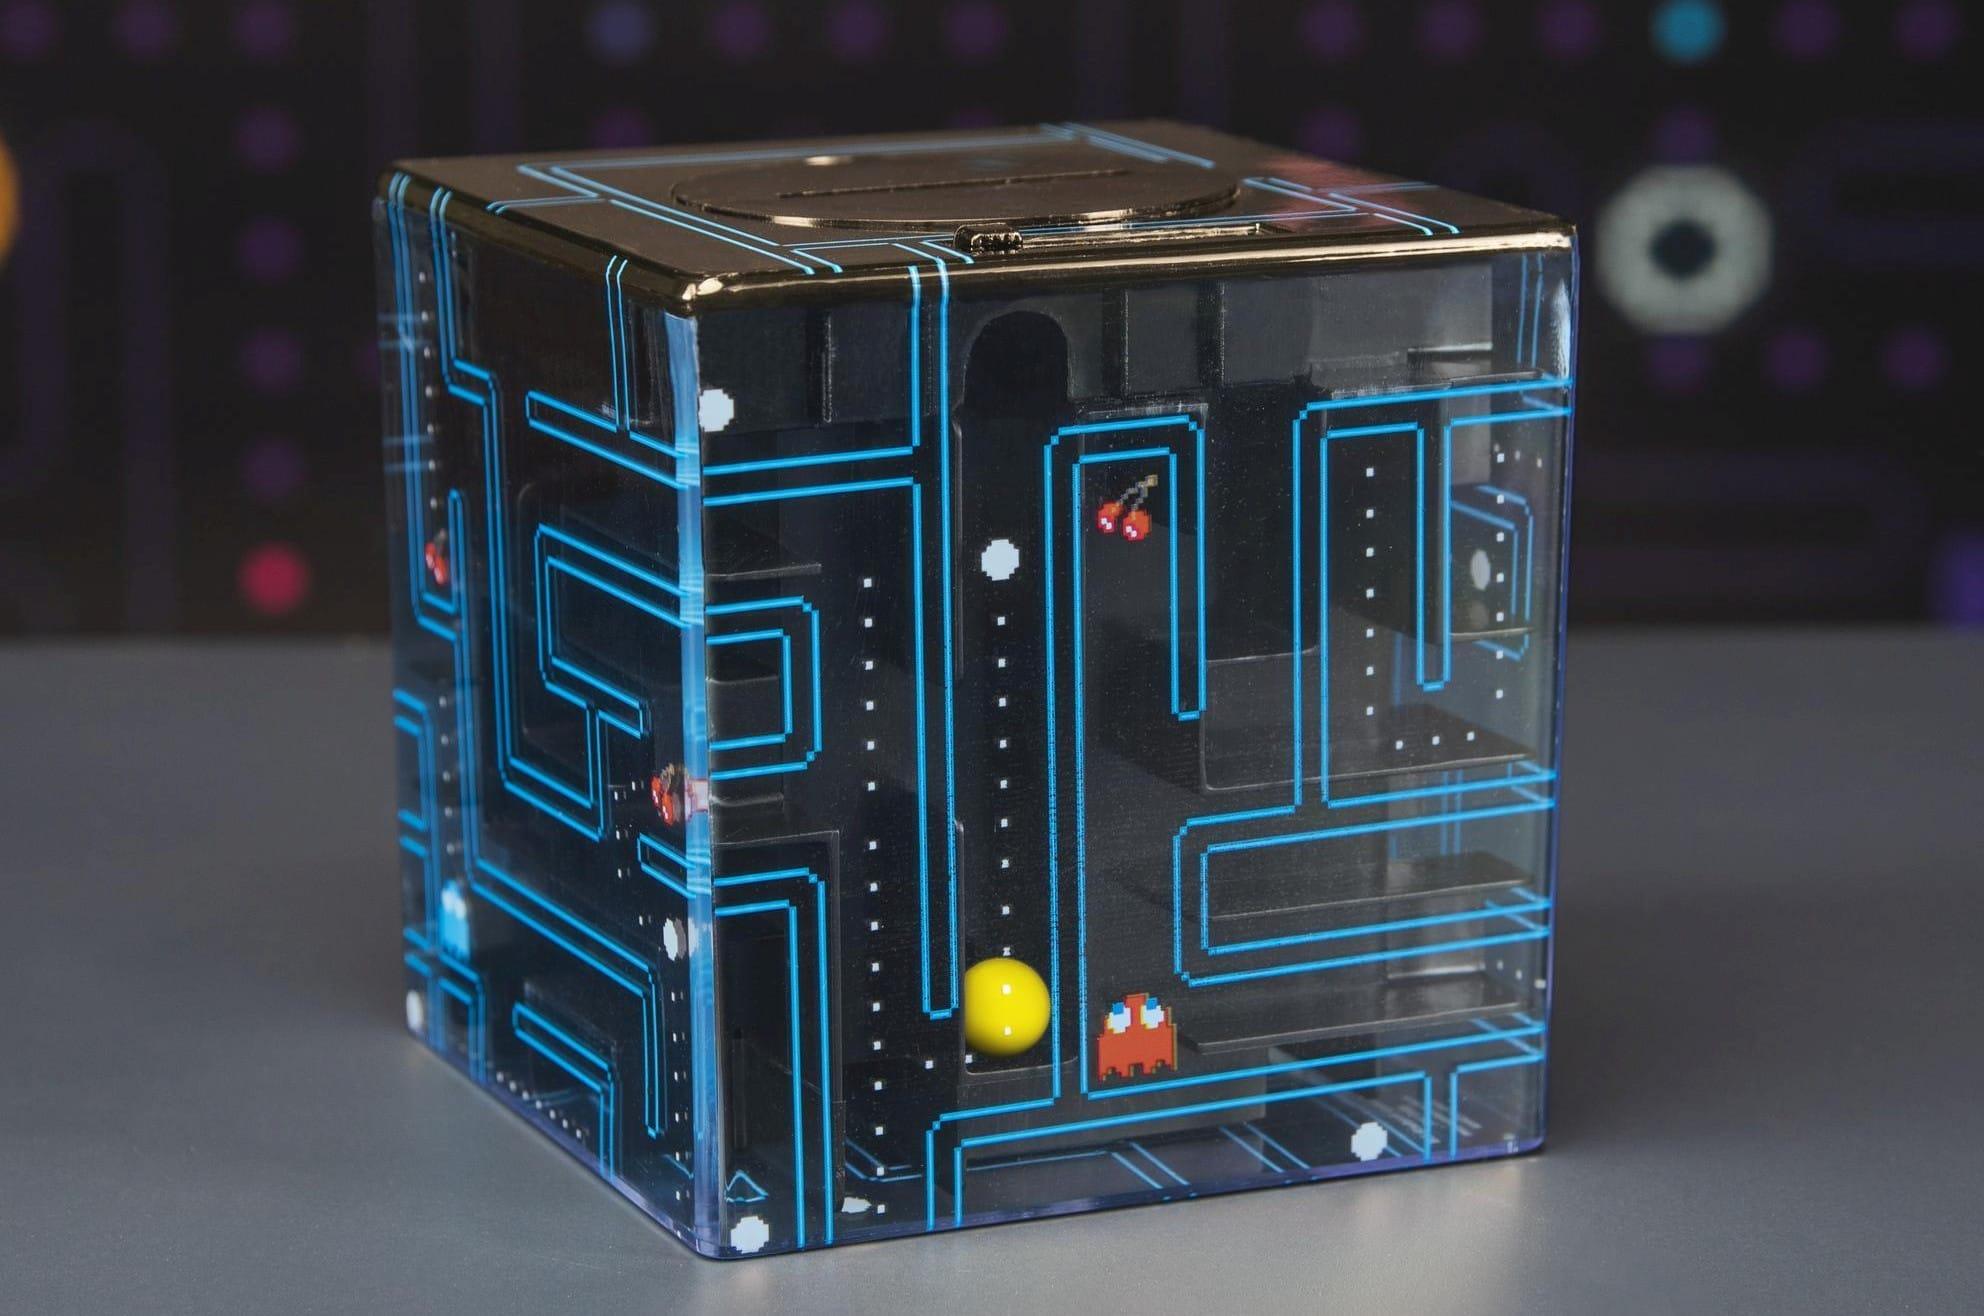 Pac-Man: Würfel-Labyrinth gegen Langeweile